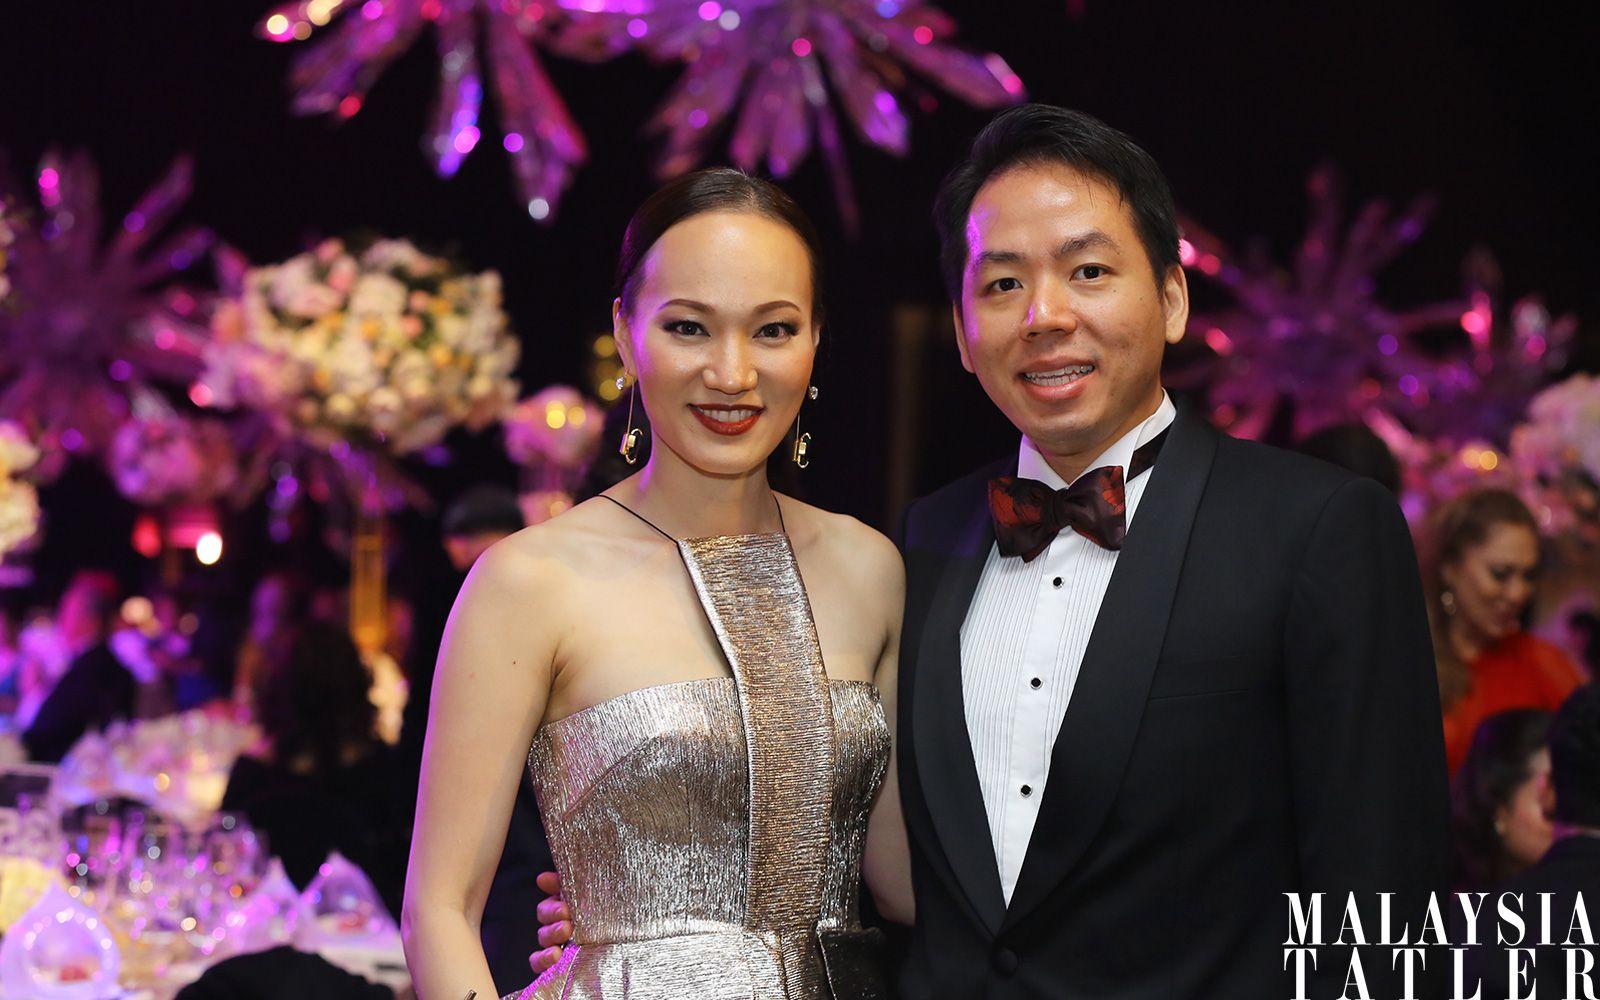 Kristine Goh and Tan Boon Seng